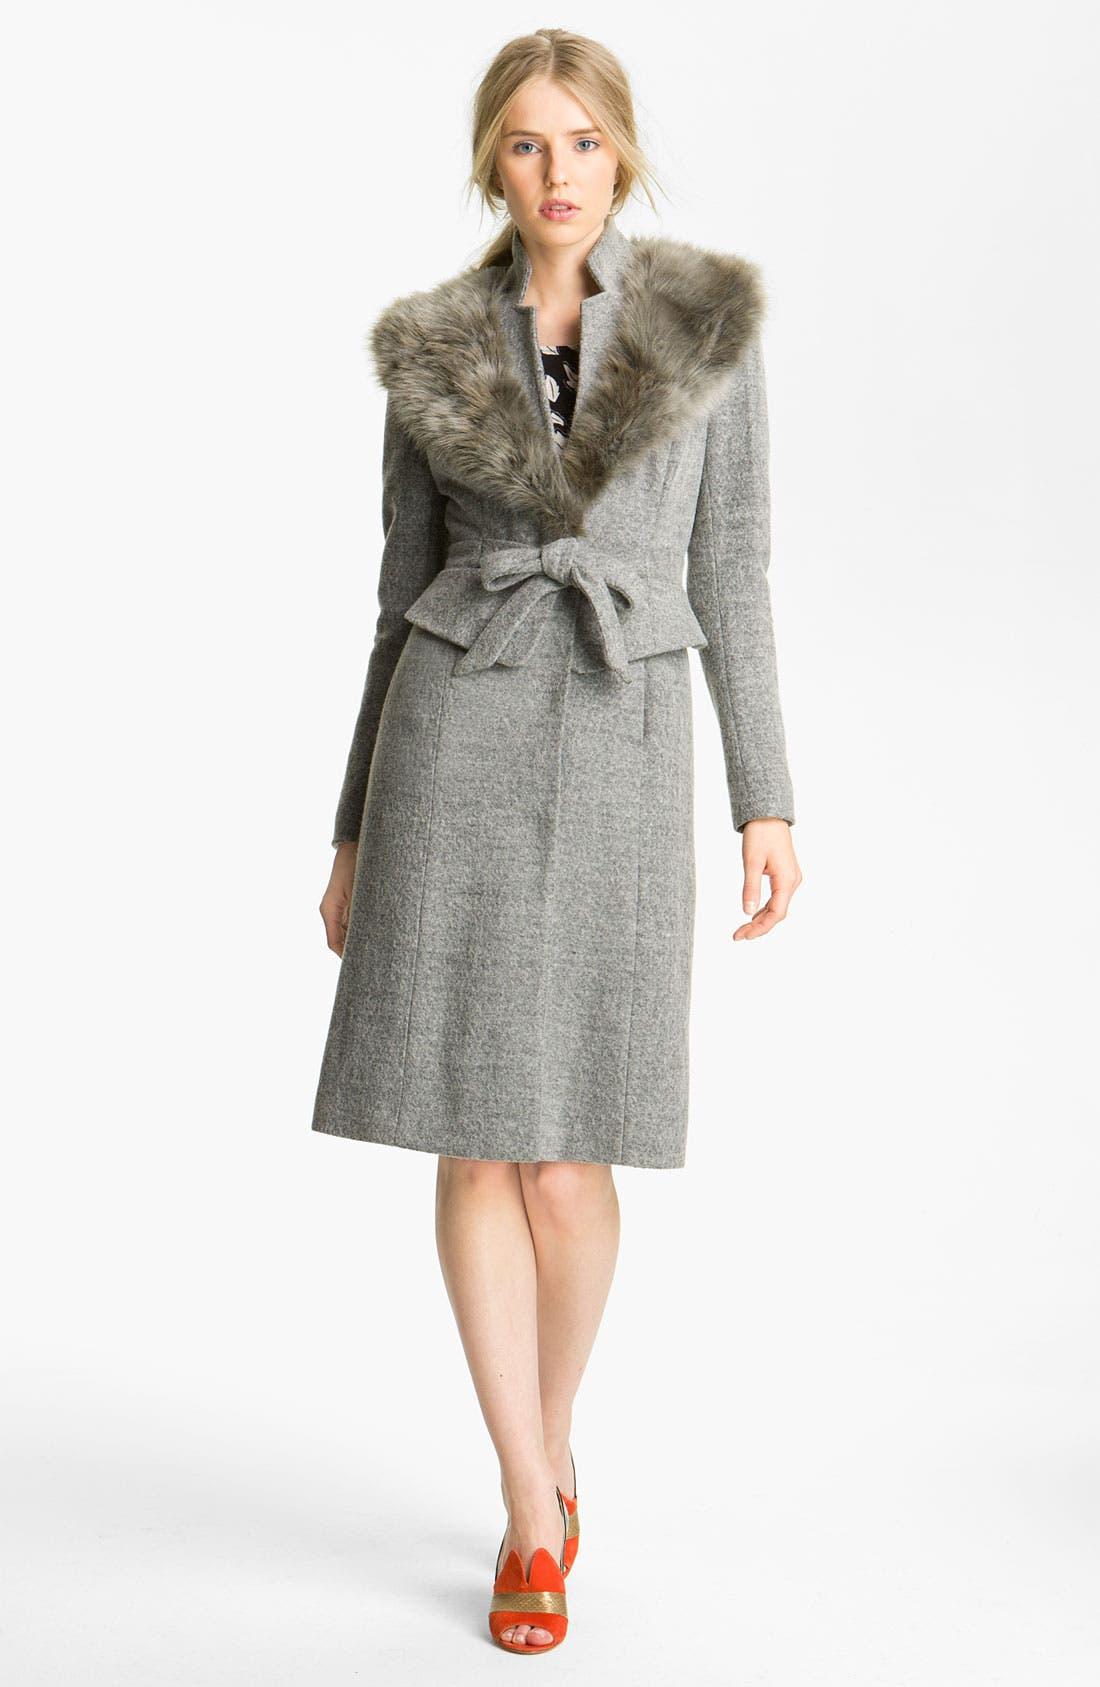 Main Image - Tracy Reese Peplum Felt Coat with Faux Fur Trim